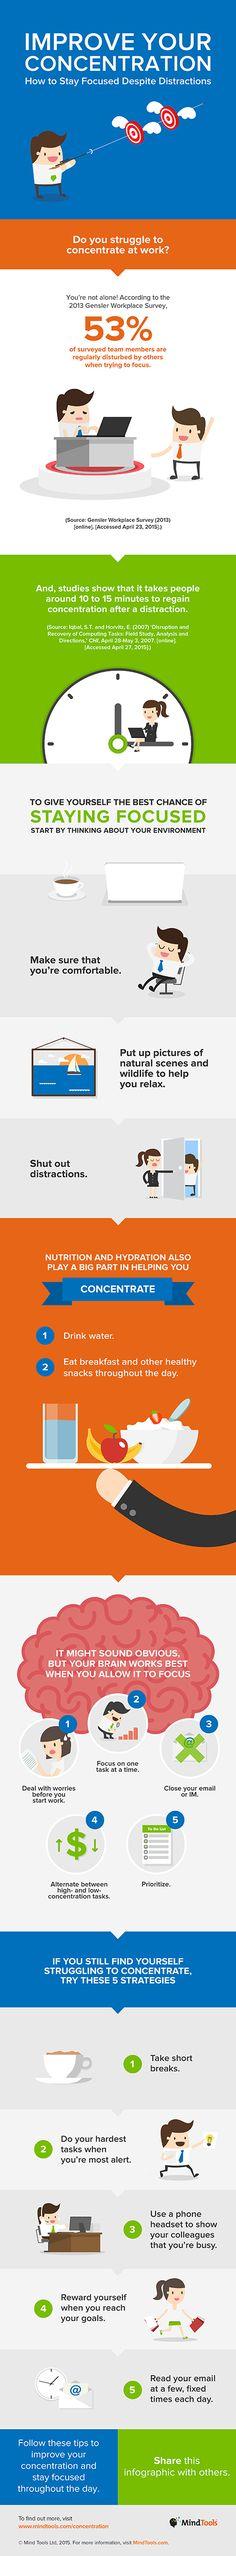 Improve Your Concentration http://www.mindtools.com/pages/article/improve-your-concentration-infographic.htm?utm_content=bufferb1c01&utm_medium=social&utm_source=pinterest.com&utm_campaign=buffer#np